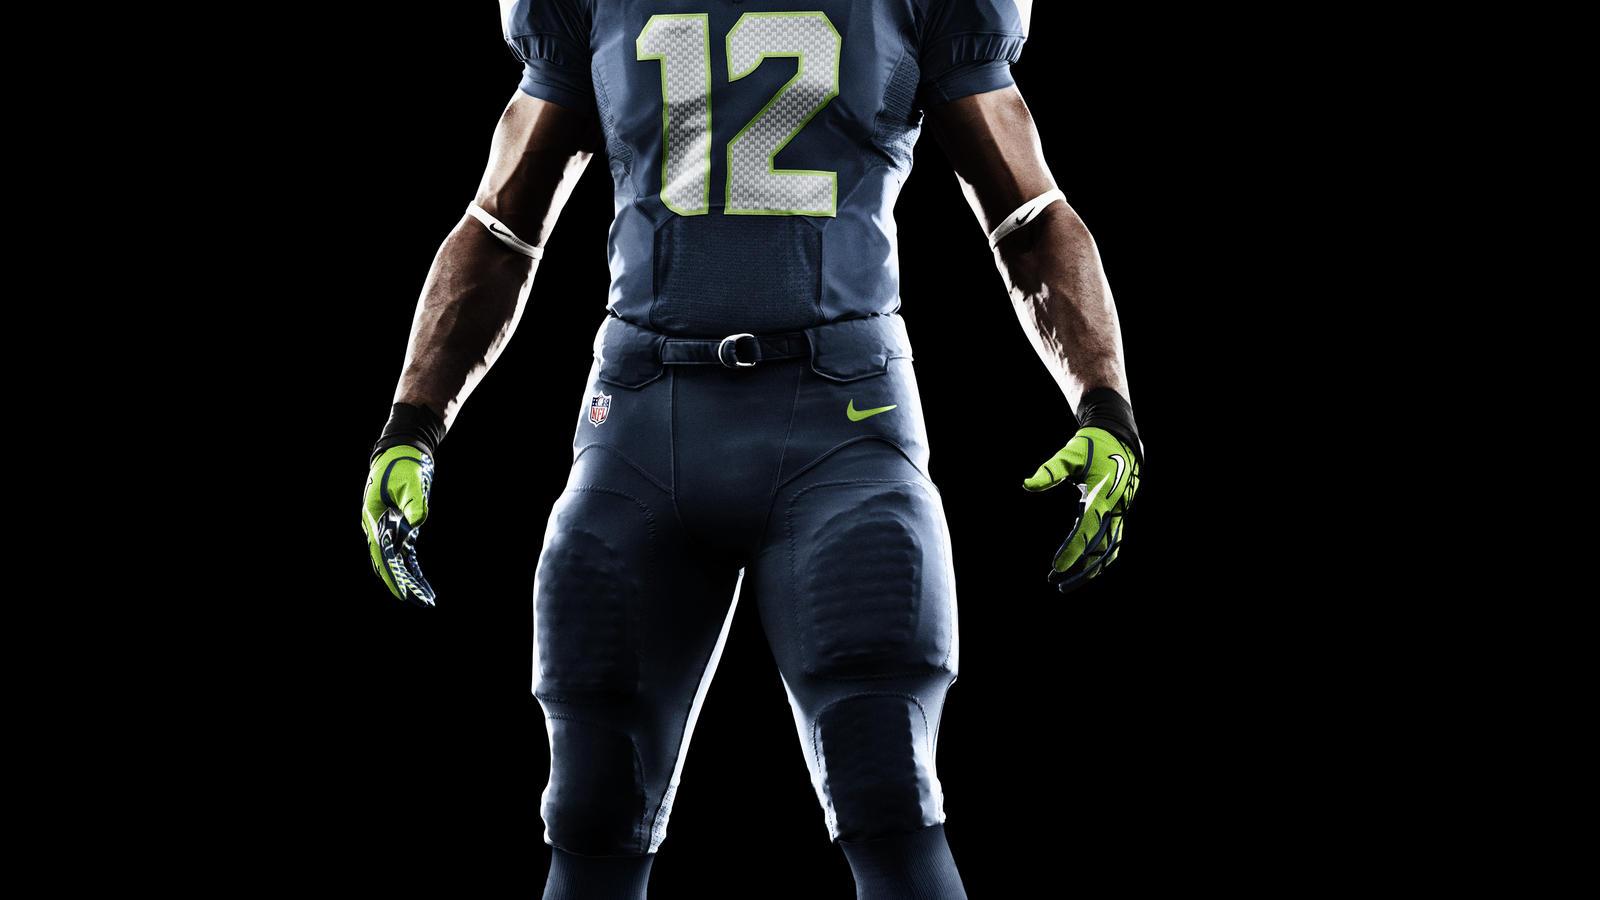 best website a47a3 46f36 Seattle Seahawks 2012 Nike Football Uniform - Nike News